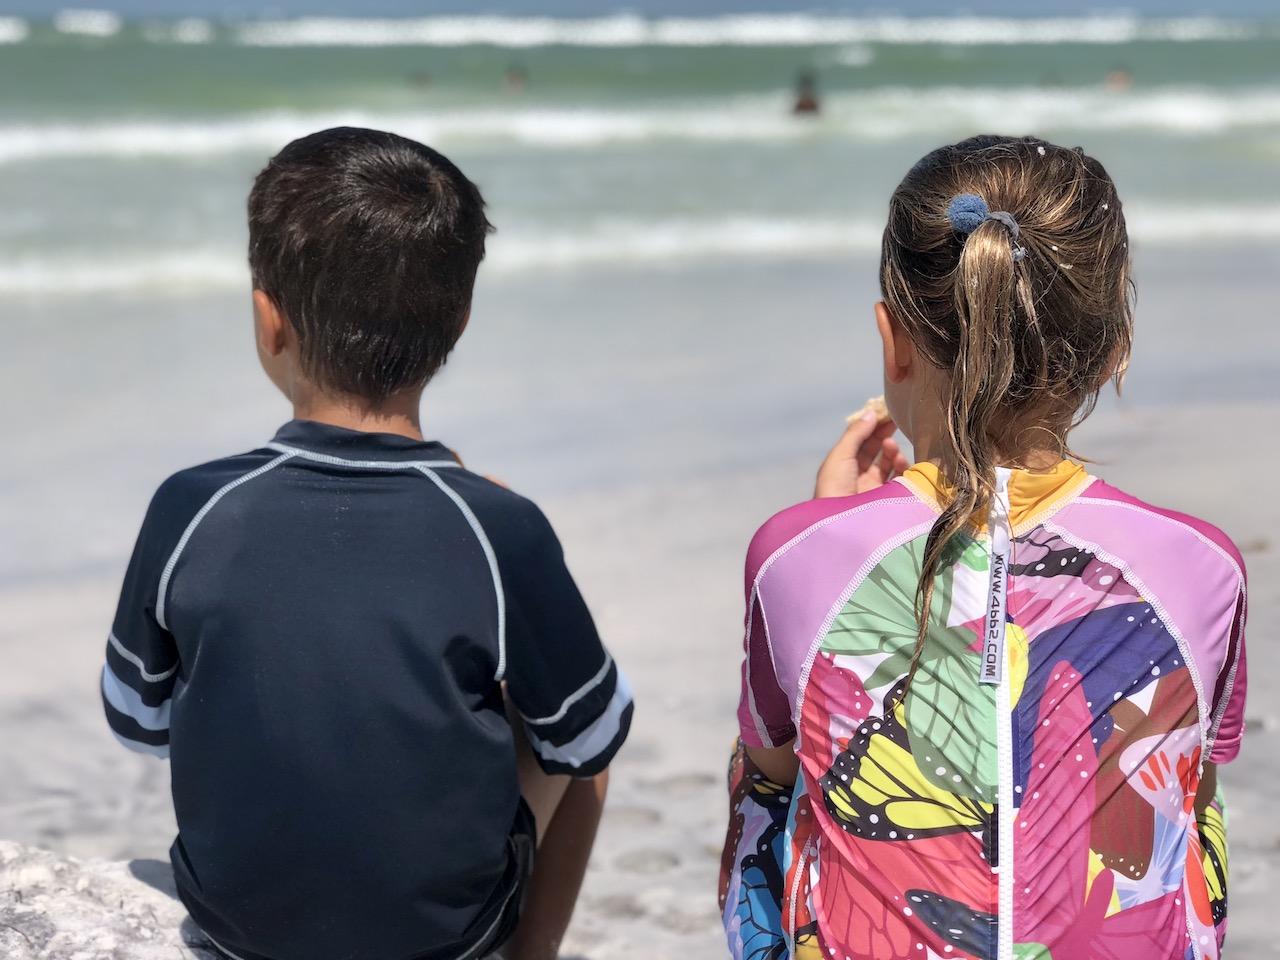 Fort de Soto Beach, near Orlando, FL, is the perfect beach to come with children